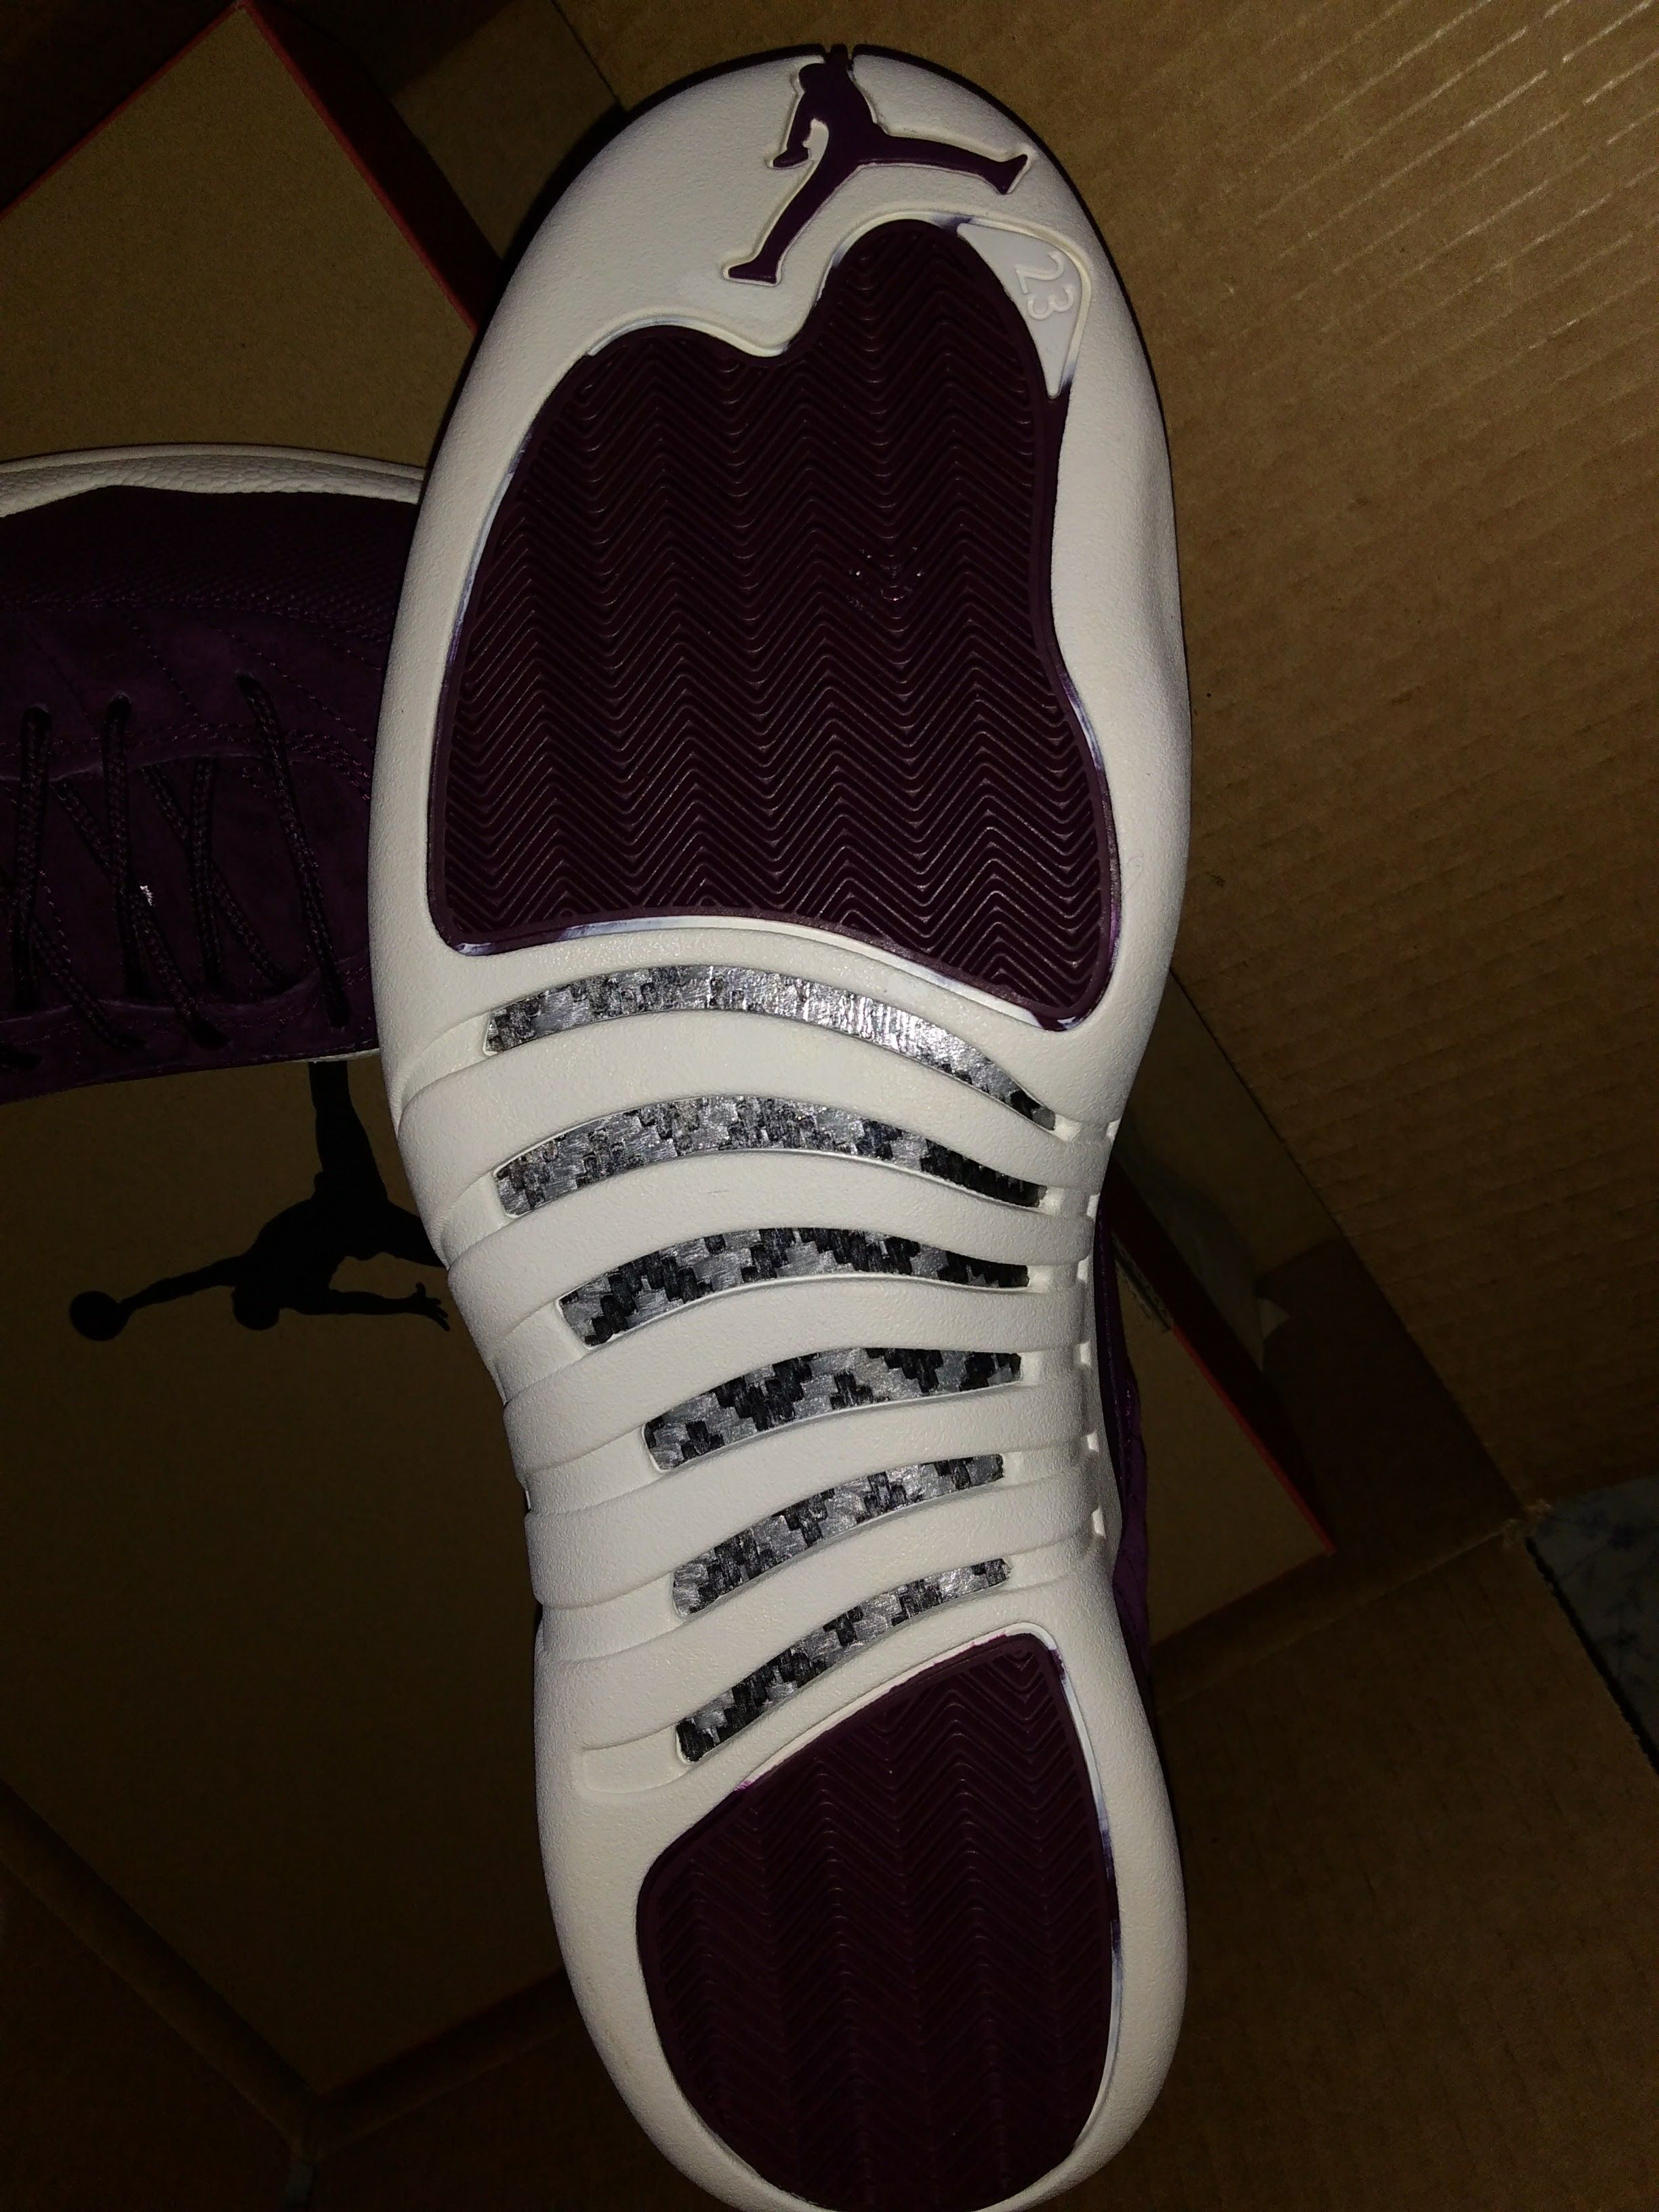 #sneakersoles of #airjordan #retro12 #Bordeaux by #NikeAirJordan - https://drewrynewsnetwork.com/forum/shoe-reviews/sneaker-reviews